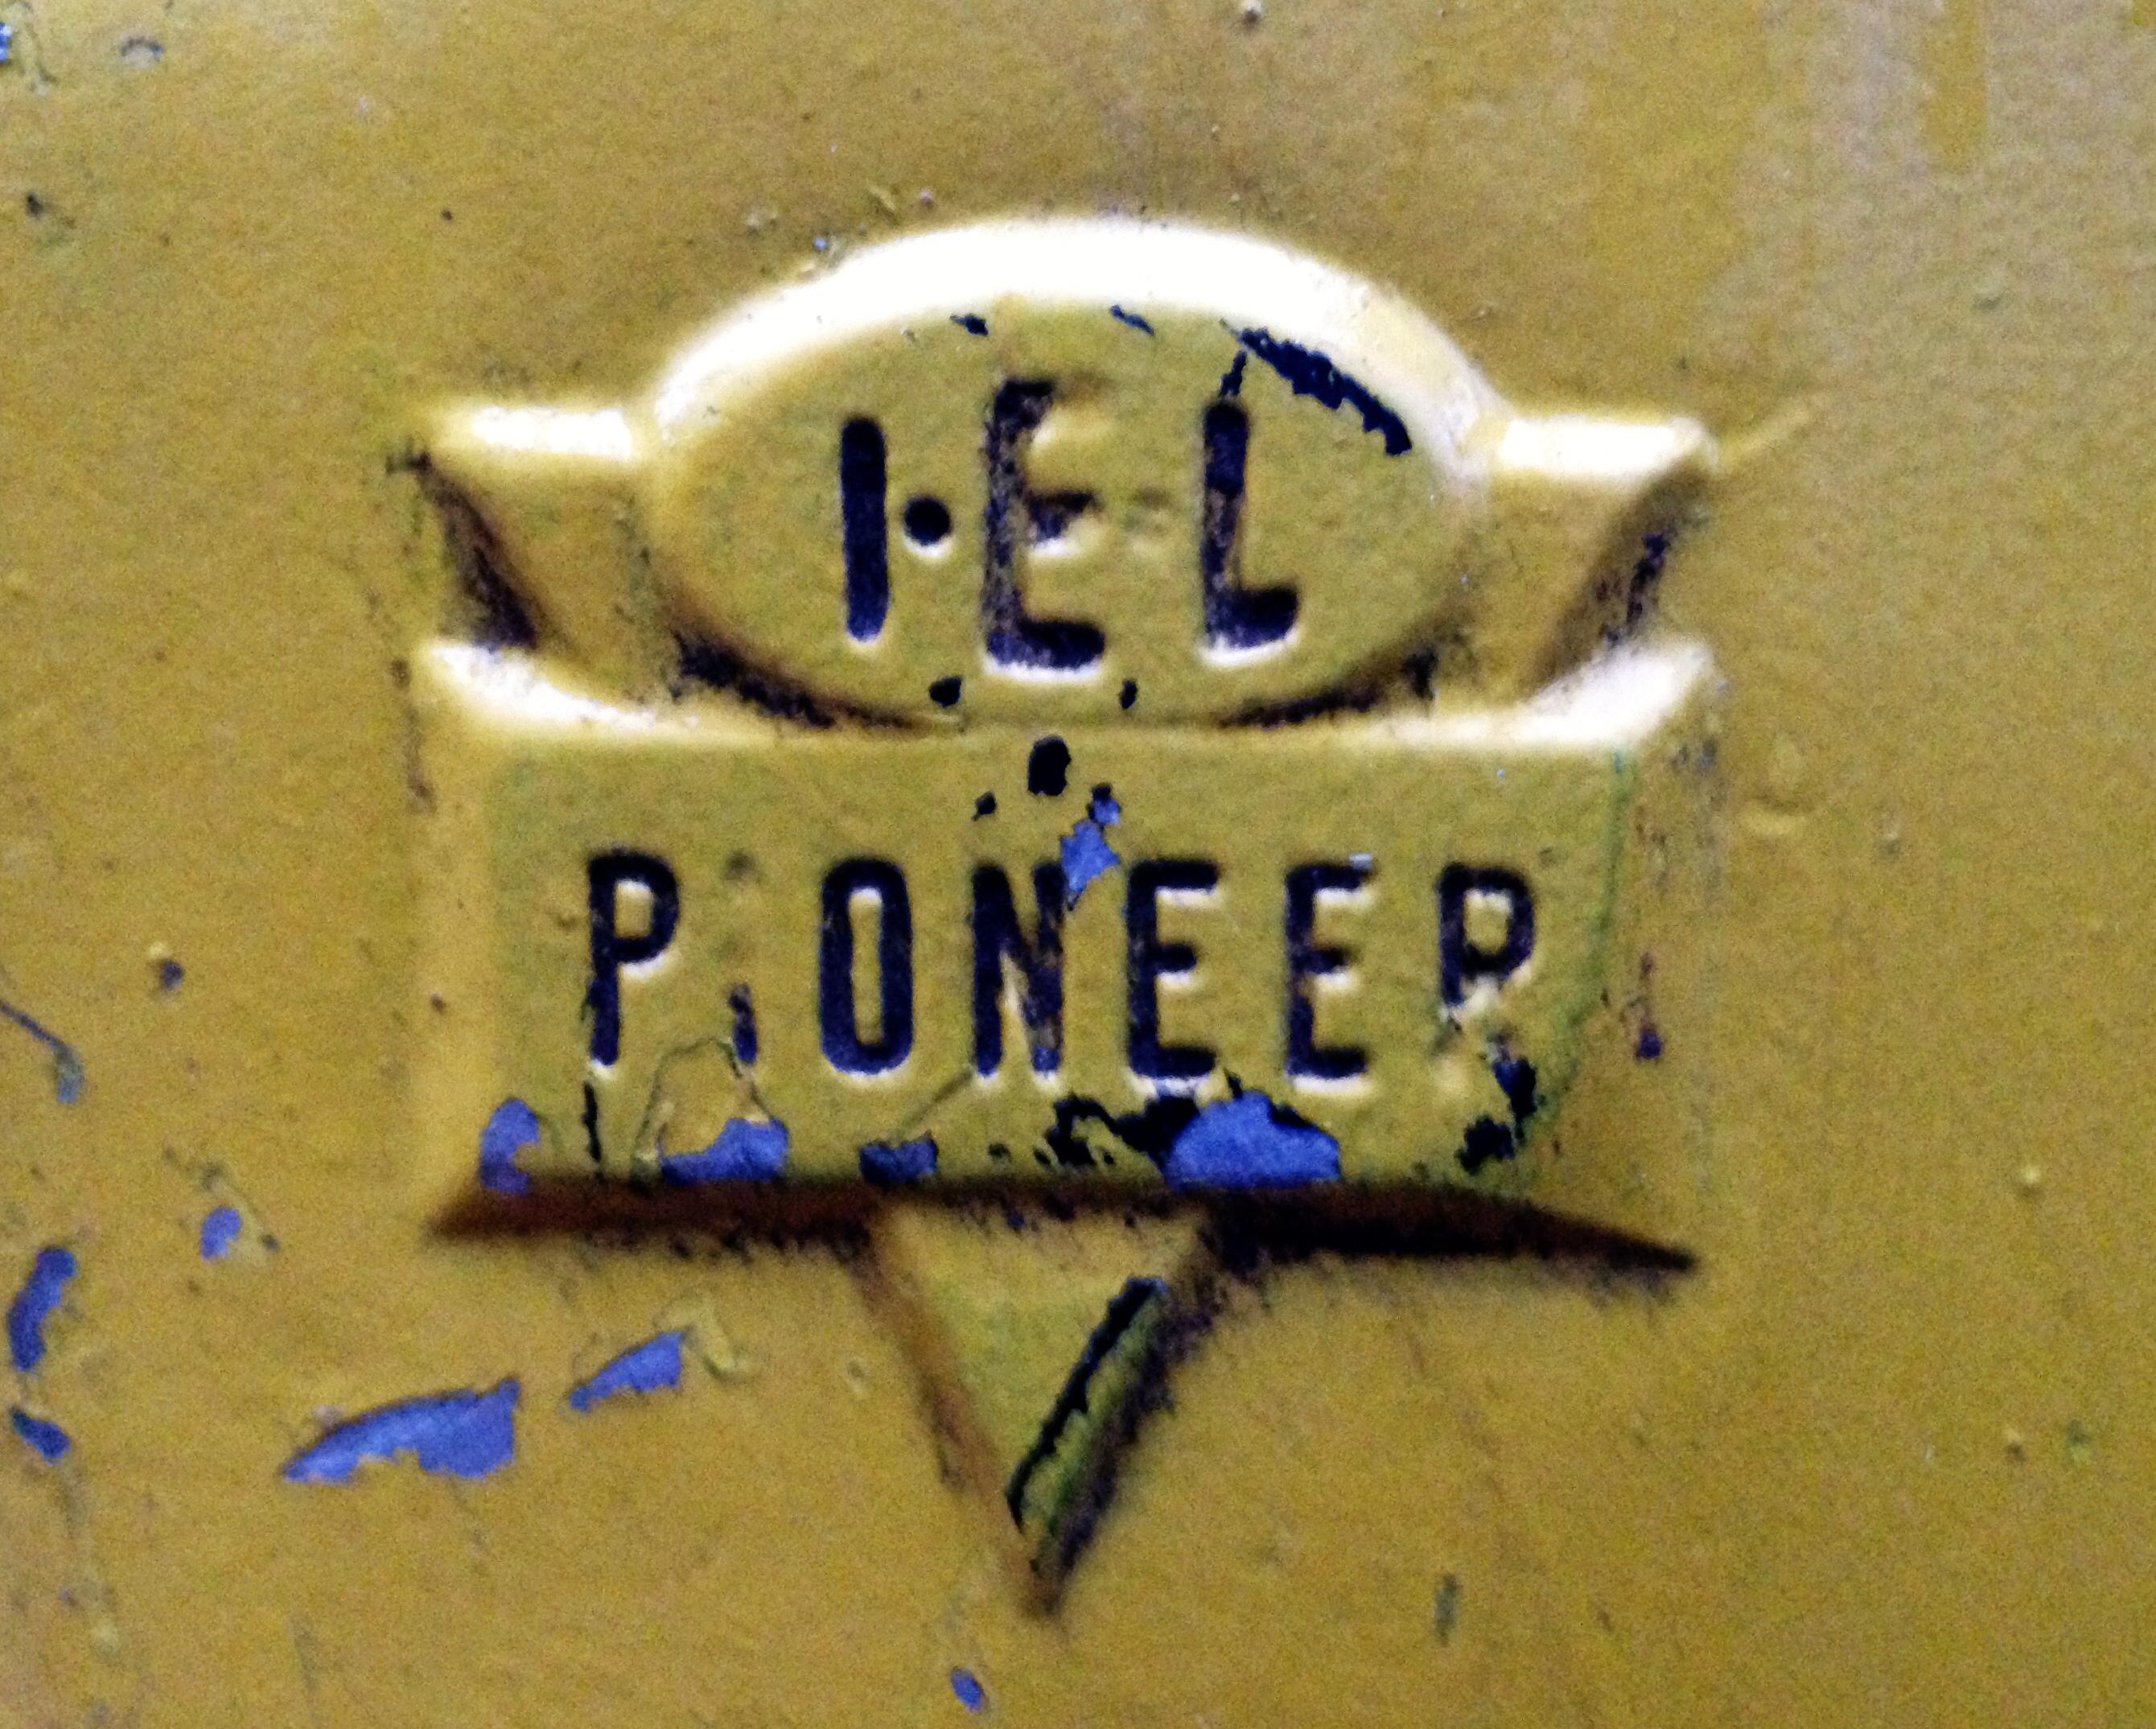 I.E.L pioneer HM chainsaw #8.JPG